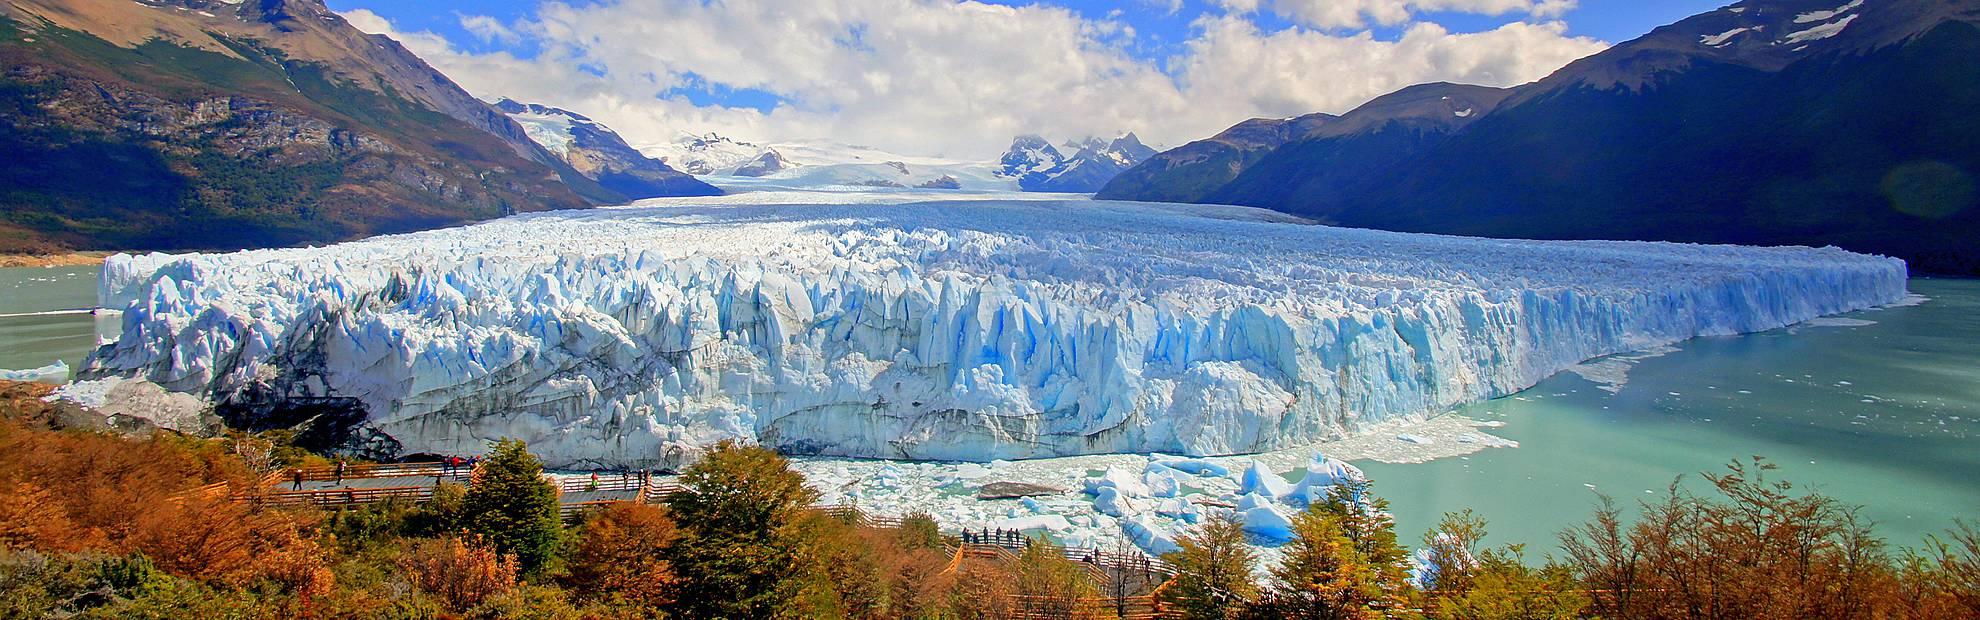 Viajes a Patagonia